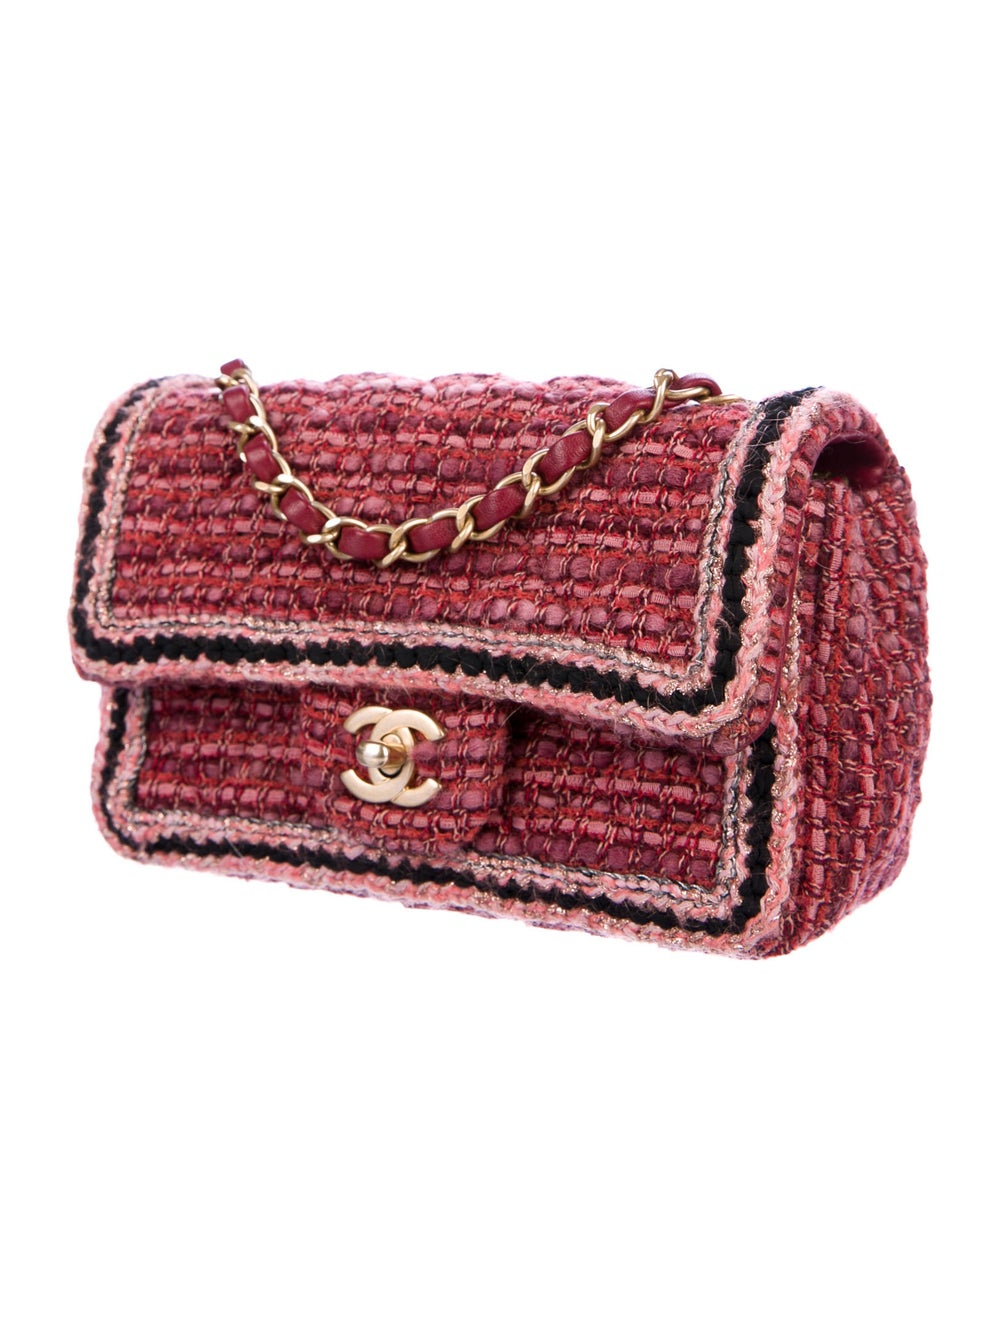 Chanel Tweed Braid Mini Flap Bag Red - image 3